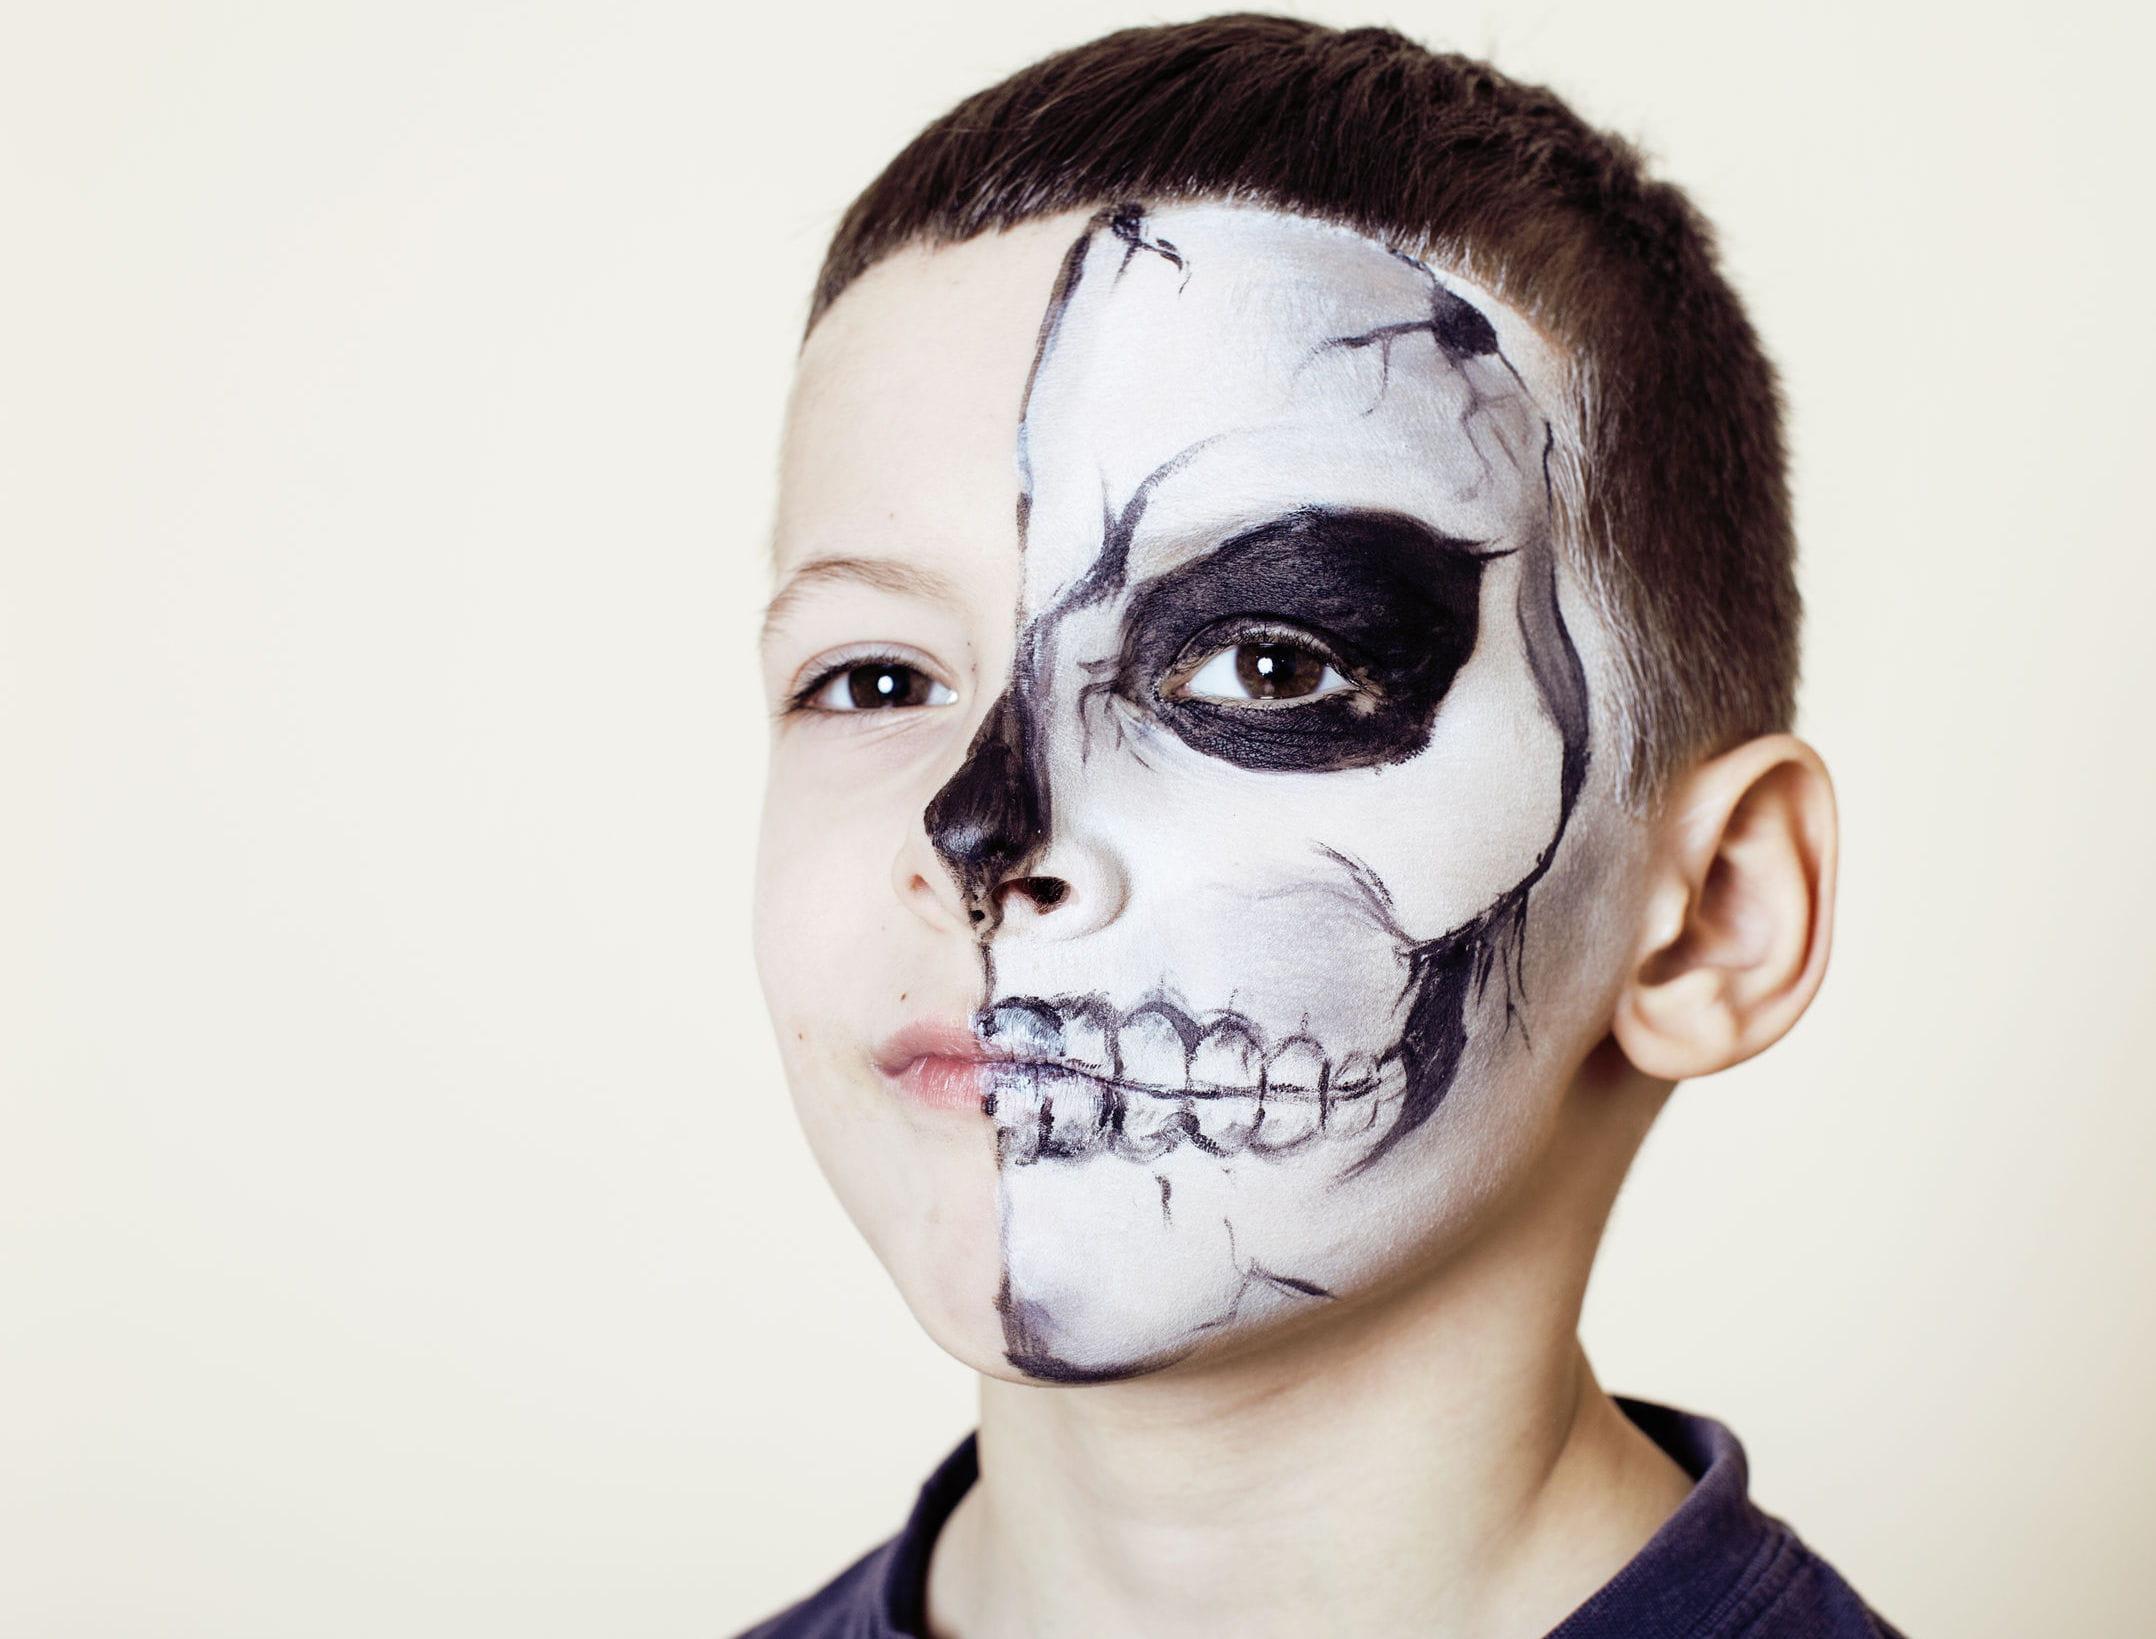 Comment maquiller mon enfant pour halloween - Maquillage halloween moitie visage ...